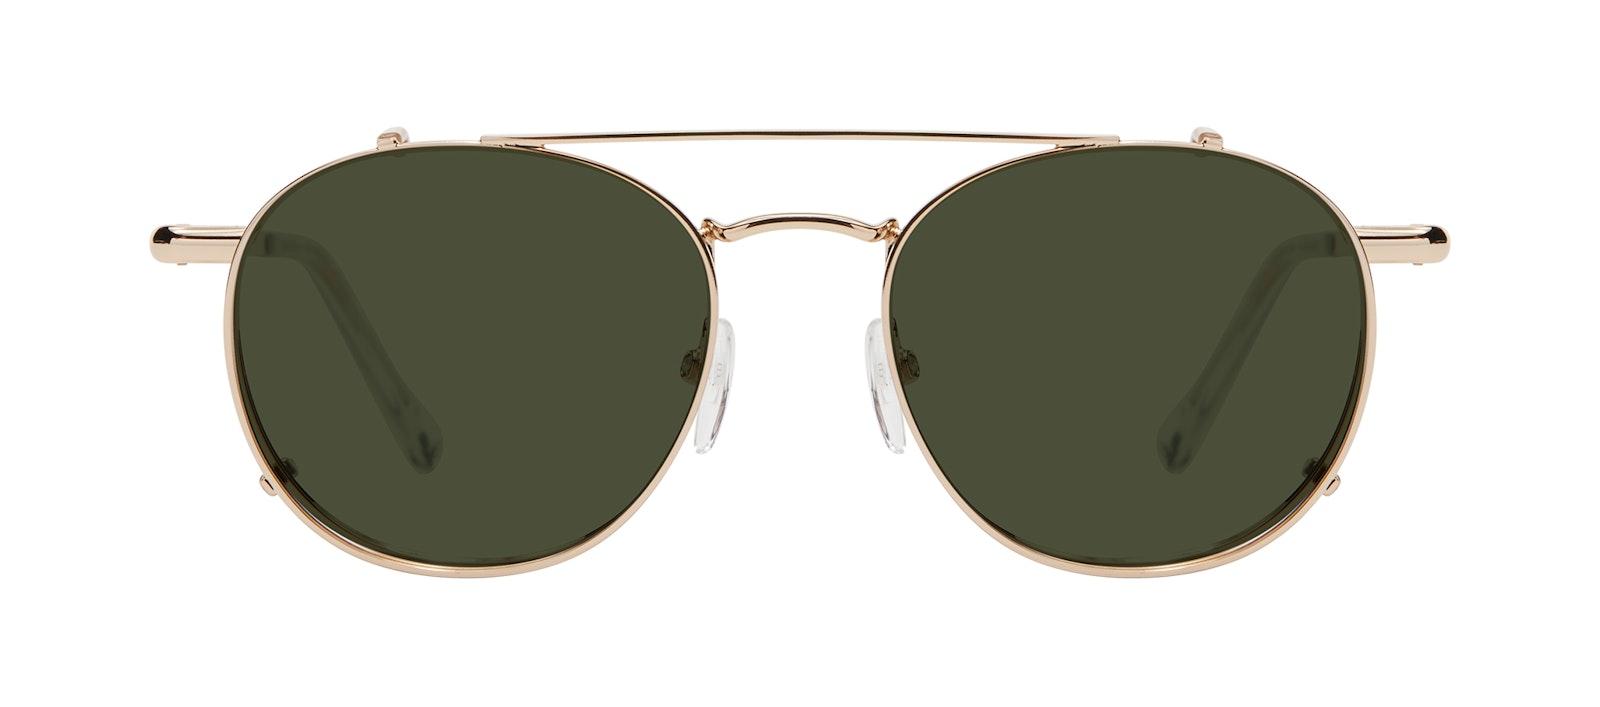 Affordable Fashion Glasses Accessory Men Women Divine Clip L Gold Side